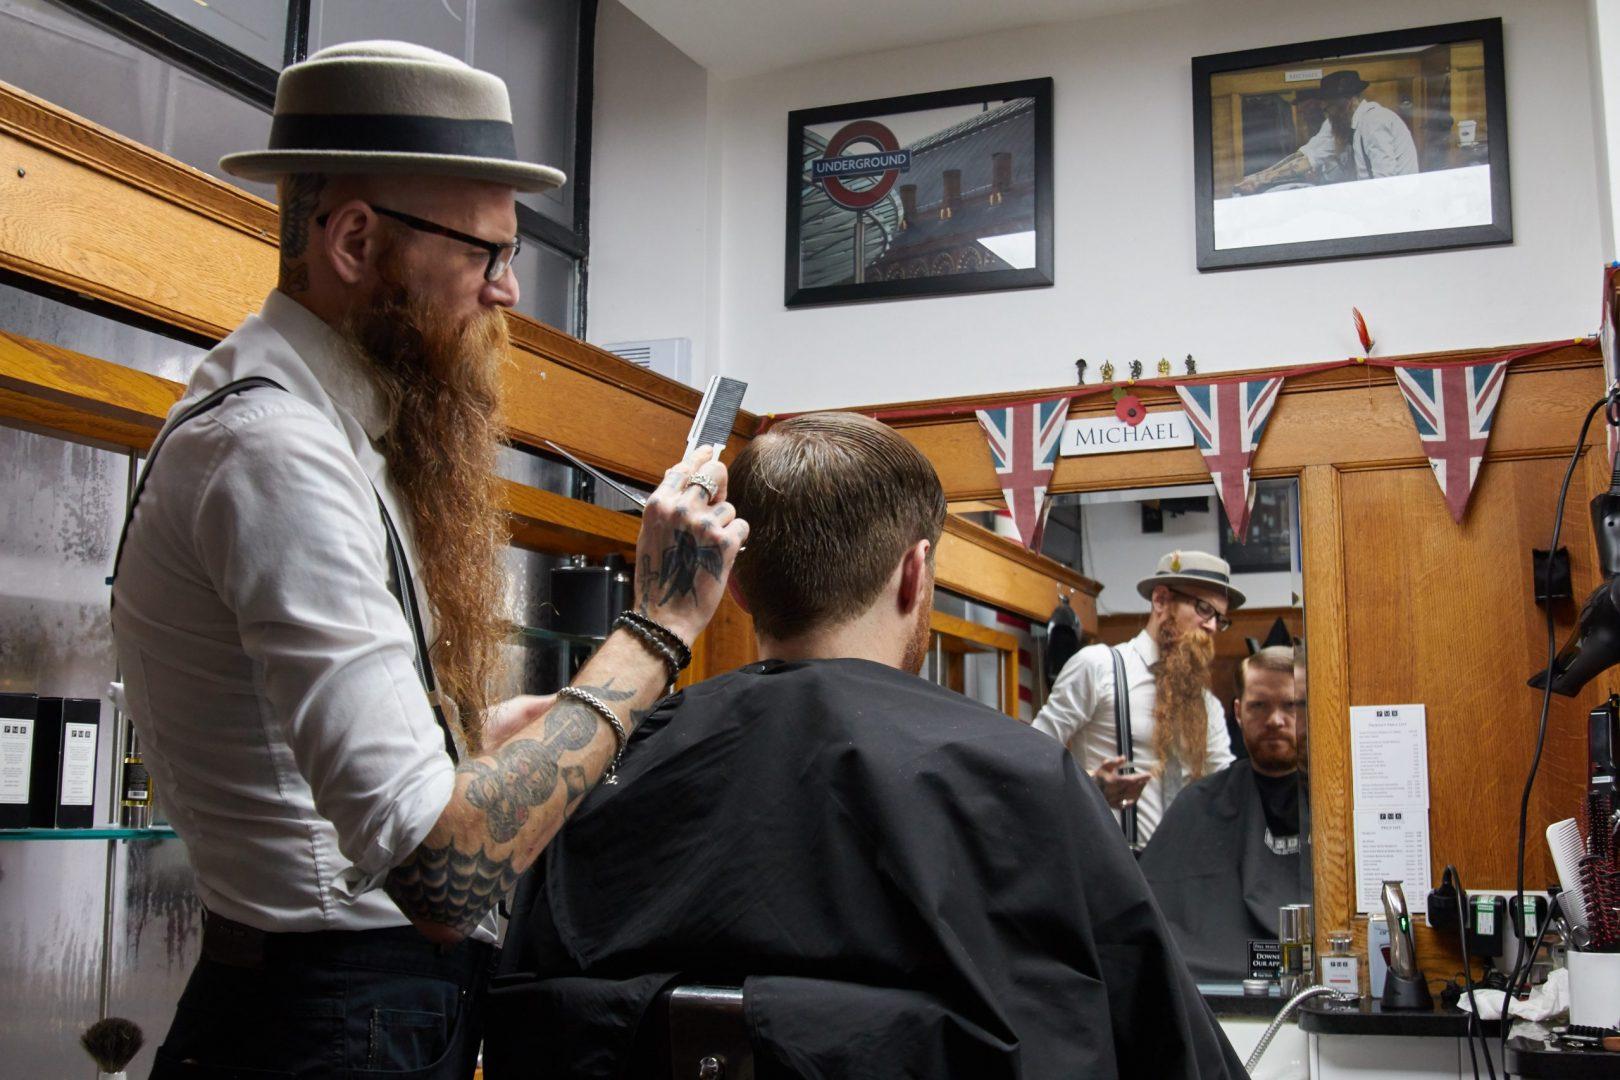 Pall Mall Barbers | Best Barbers Near Me | London Barbers | barbers near me, barber, barbers, beard barber, barber shop, best barber, best barbers, barbers London -